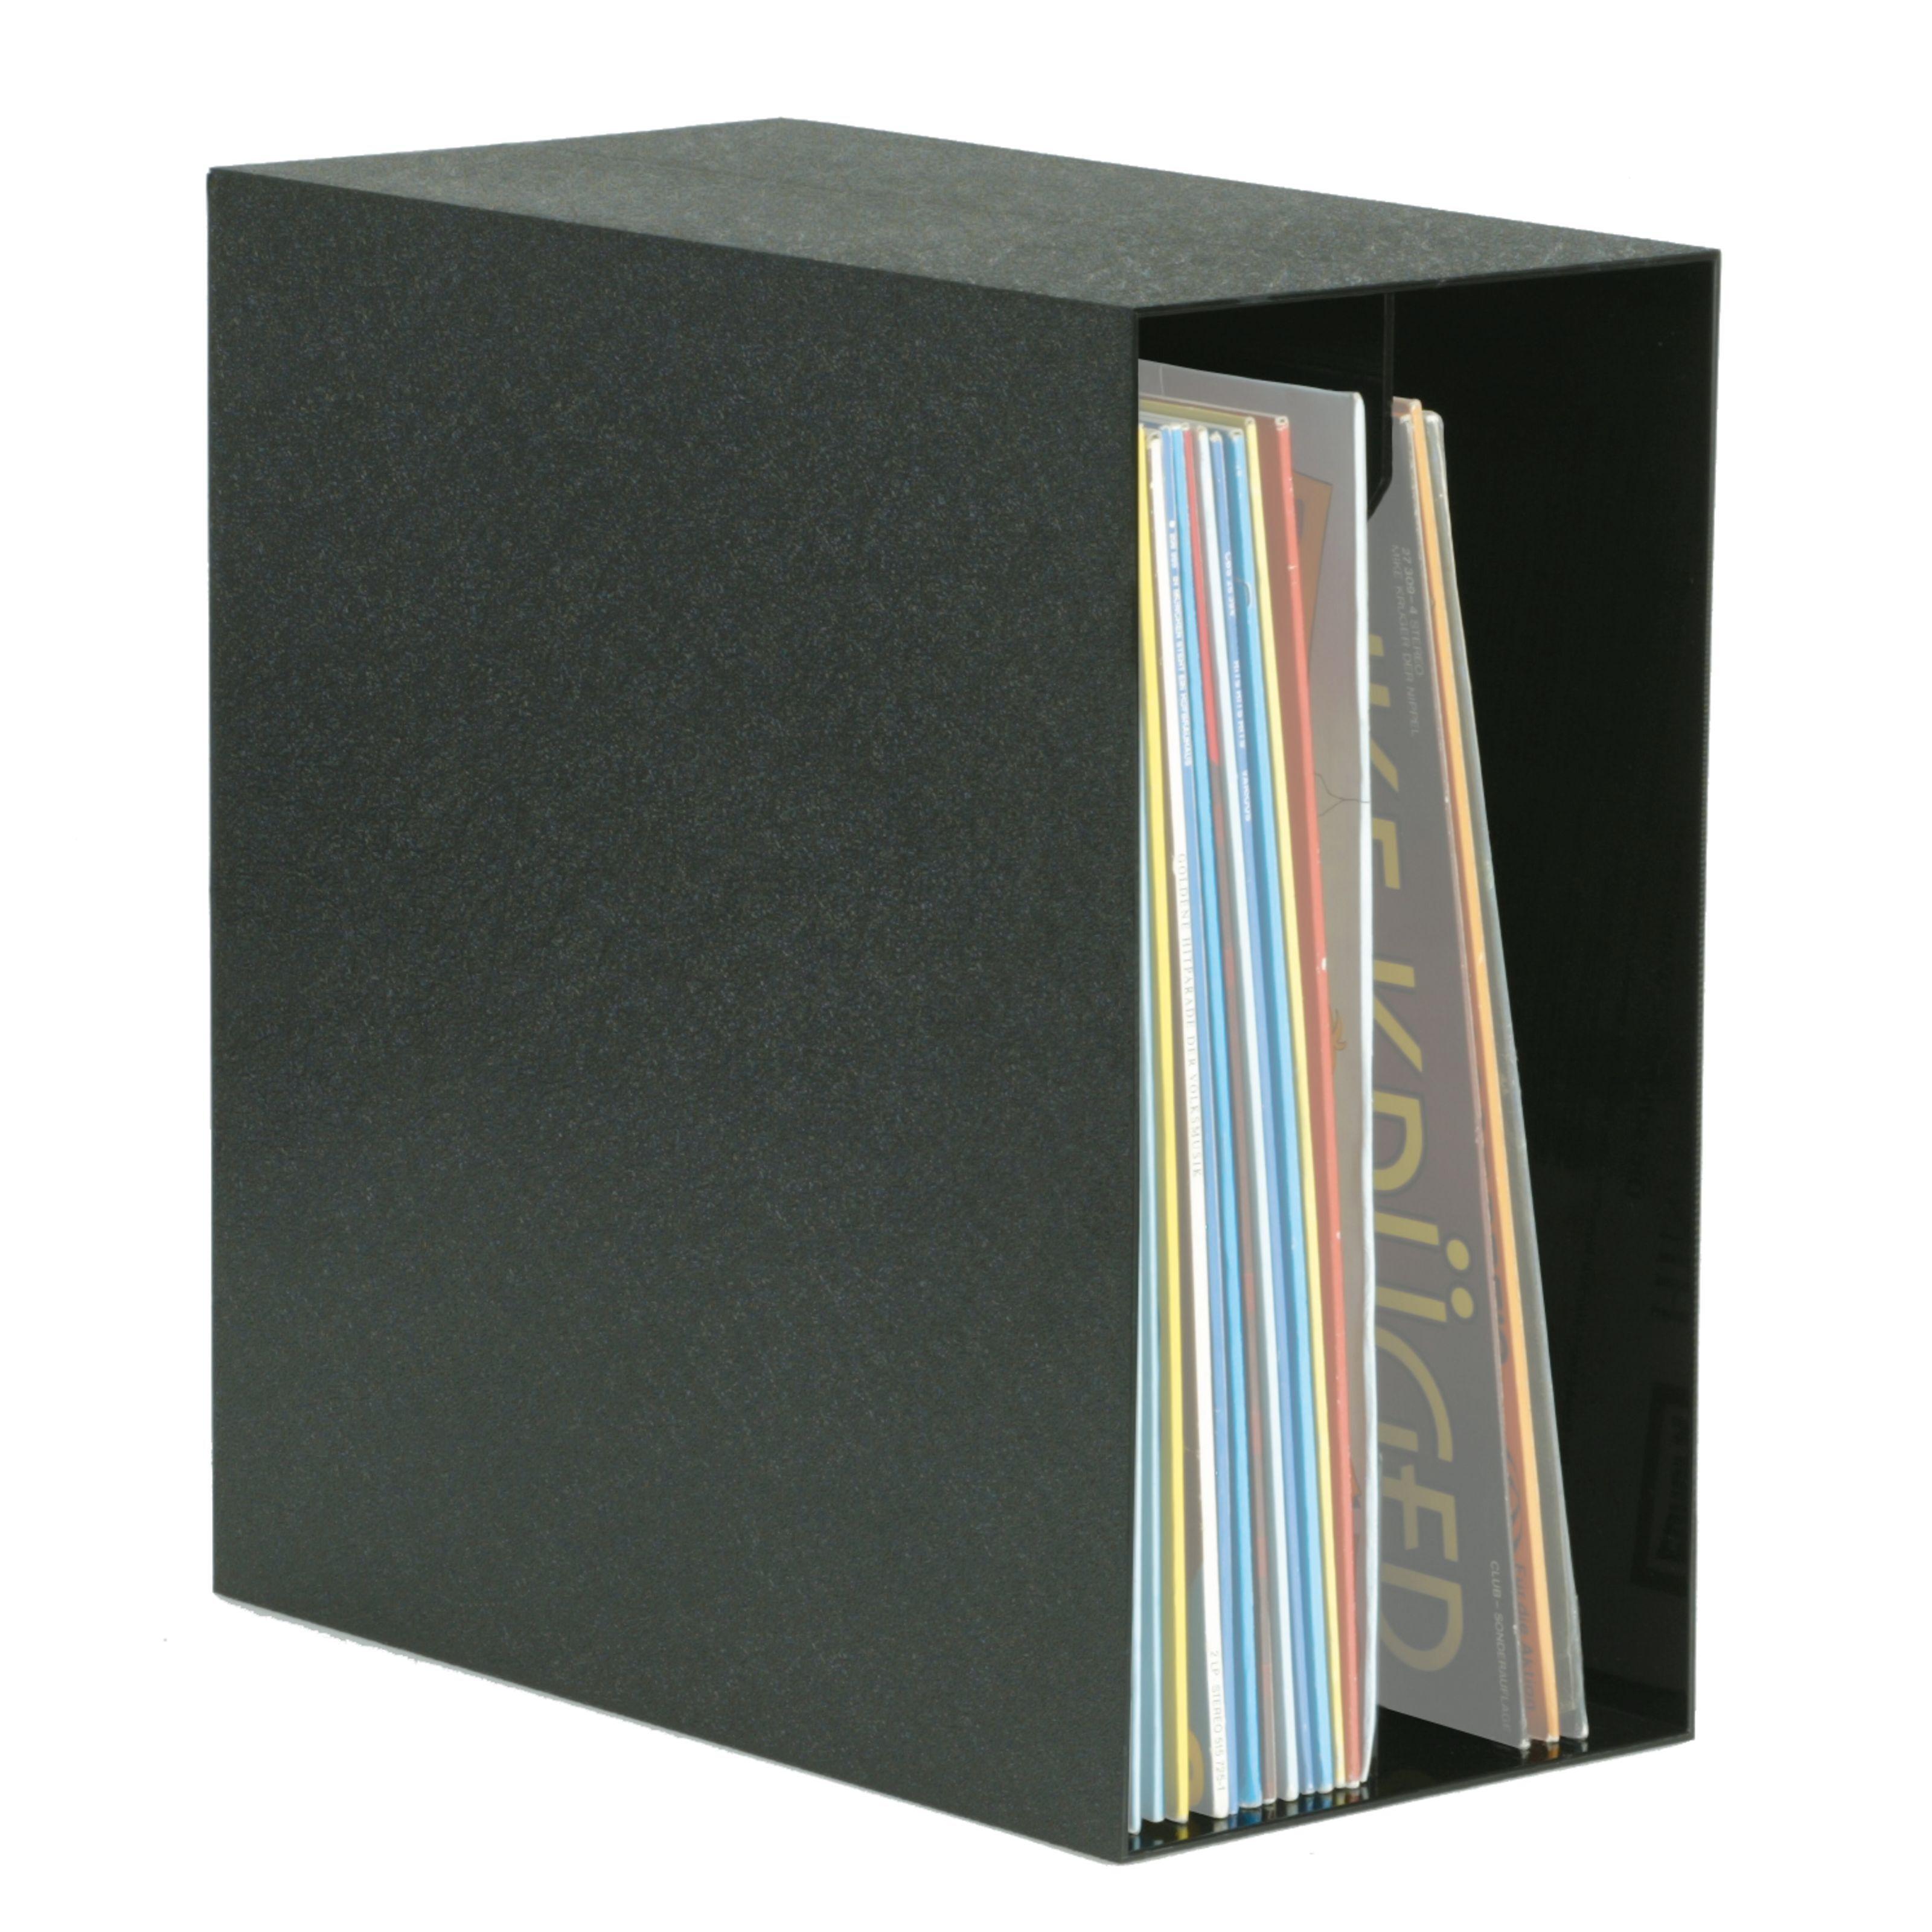 Knosti Archifix-Box black for 50 LP´s